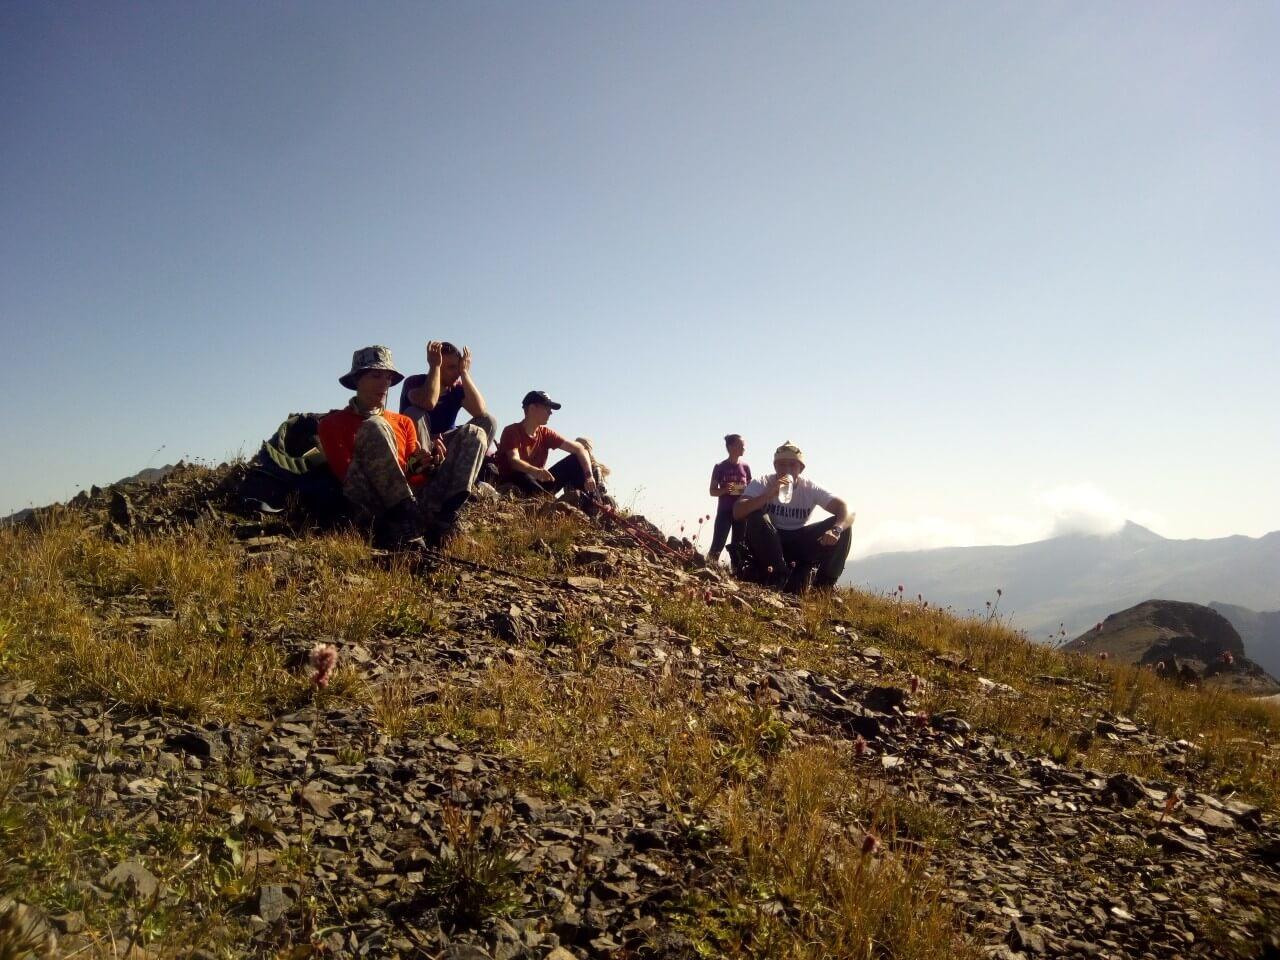 Склон горы Речепста